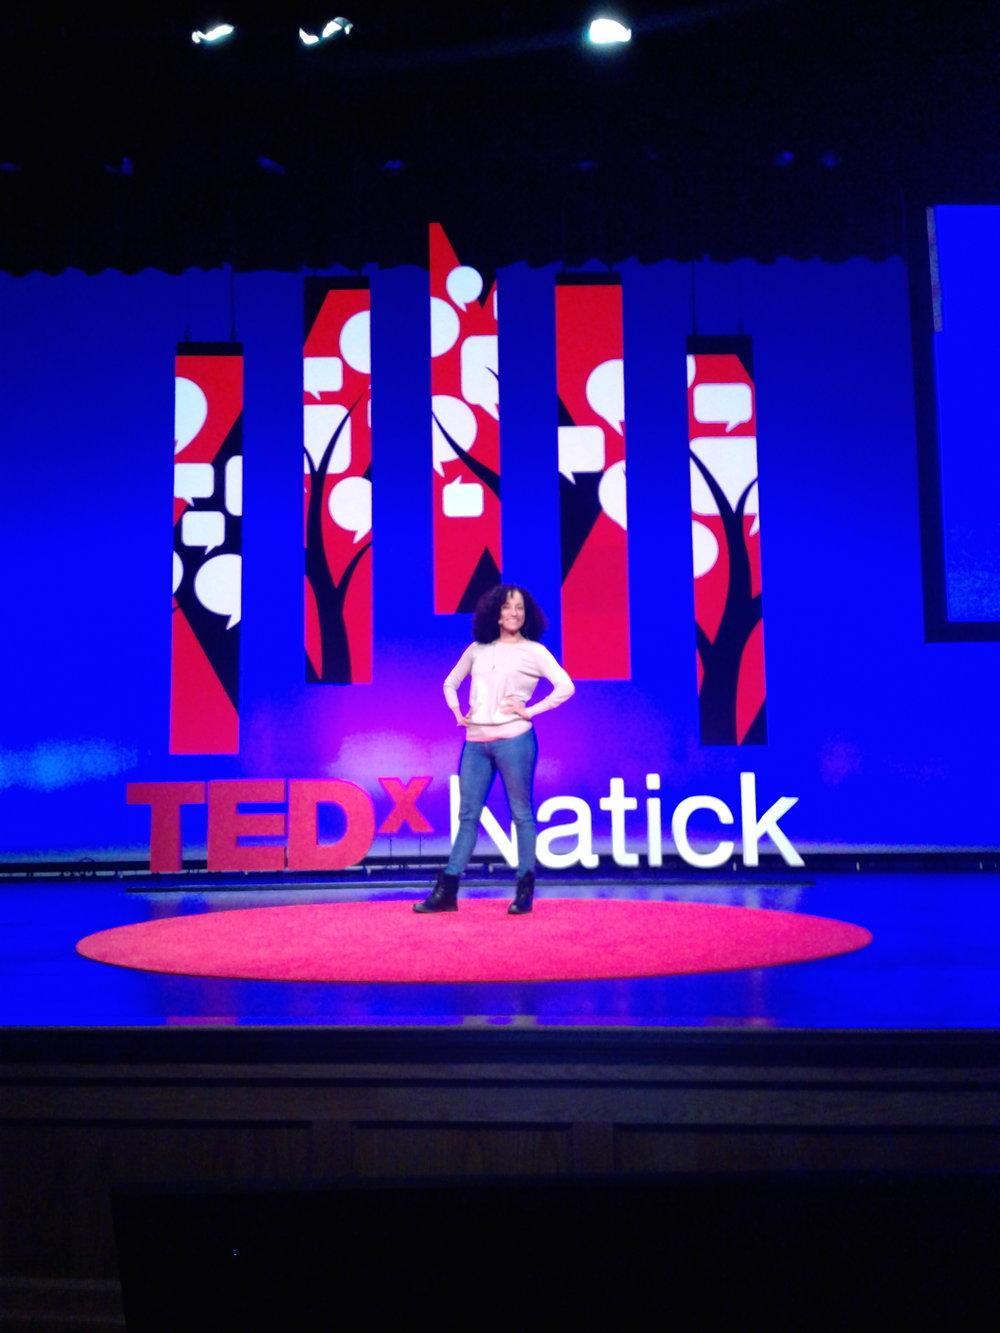 Tedx Natick 2018